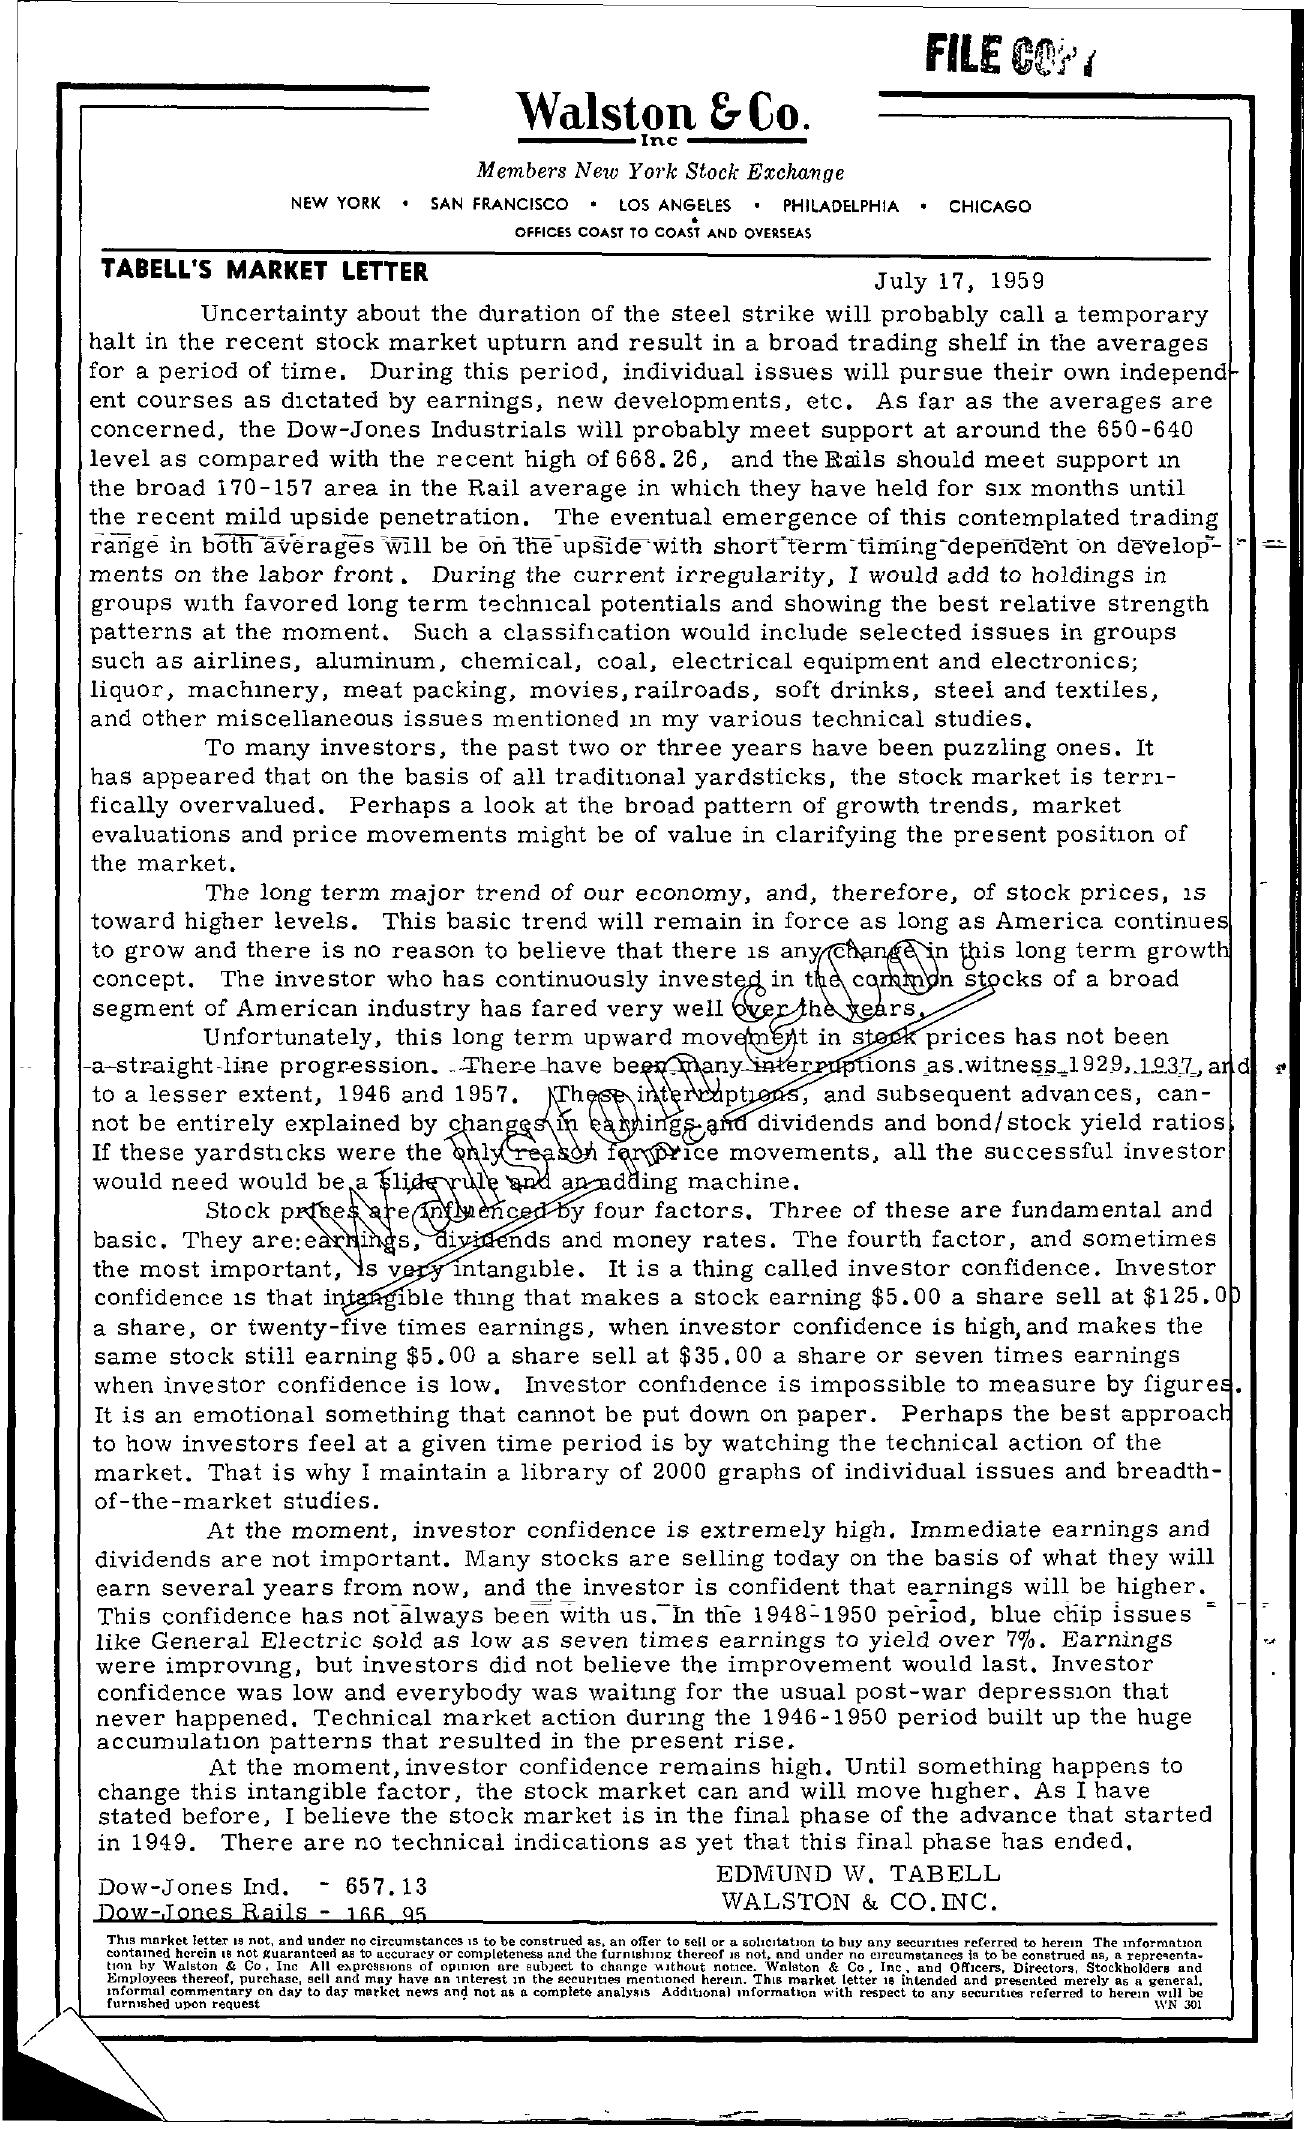 Tabell's Market Letter - July 17, 1959